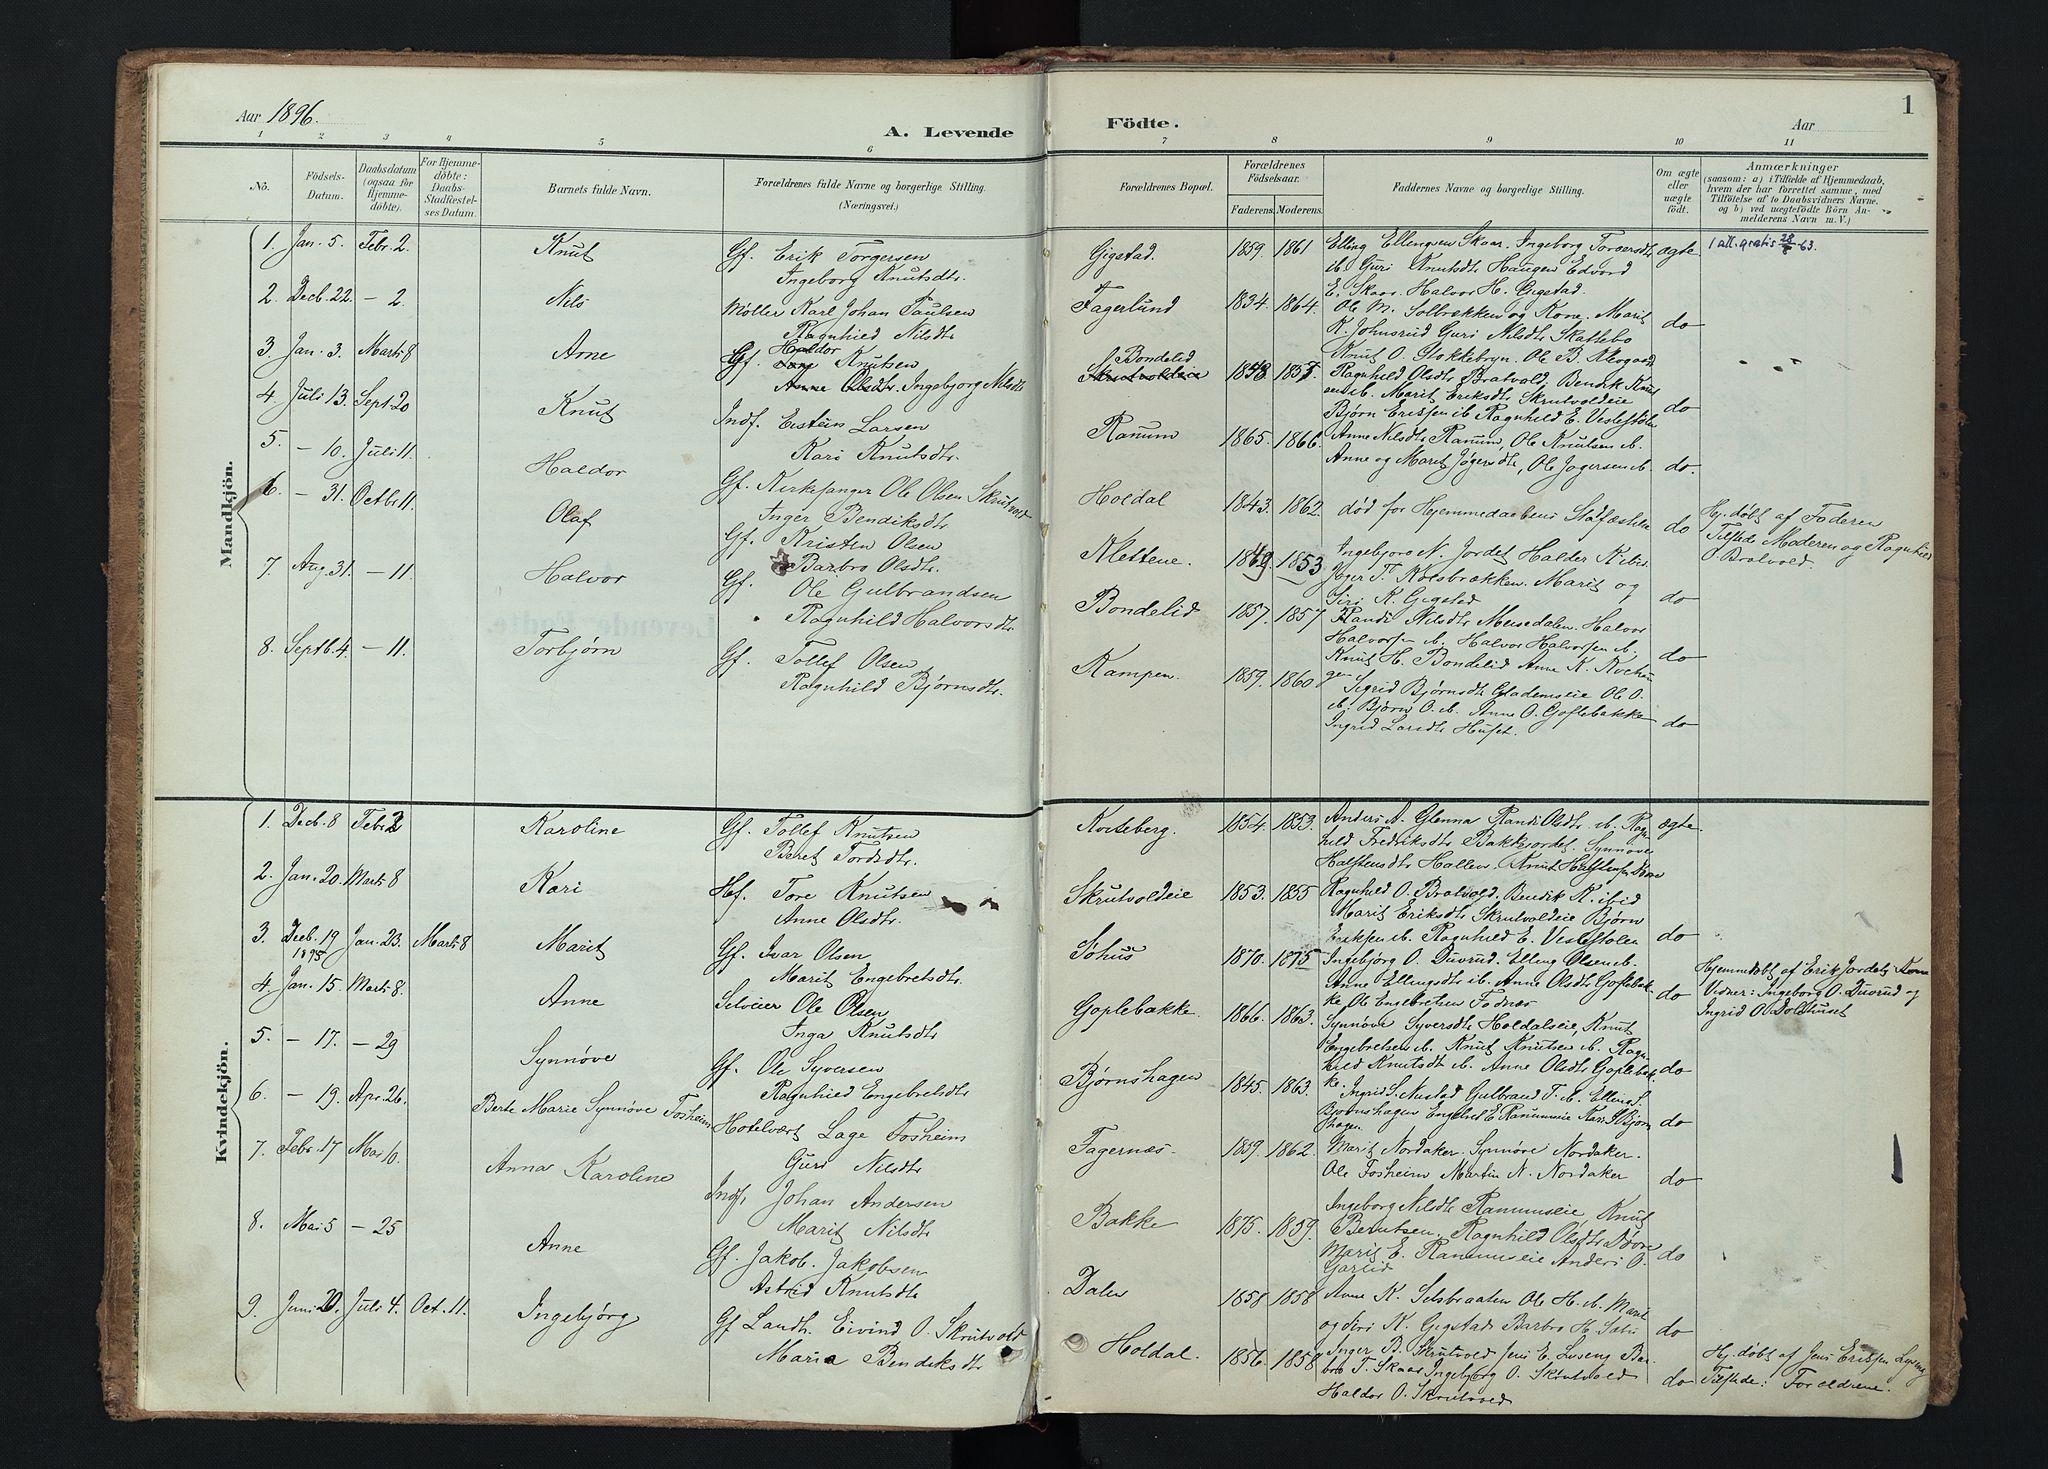 SAH, Nord-Aurdal prestekontor, Ministerialbok nr. 15, 1896-1914, s. 1